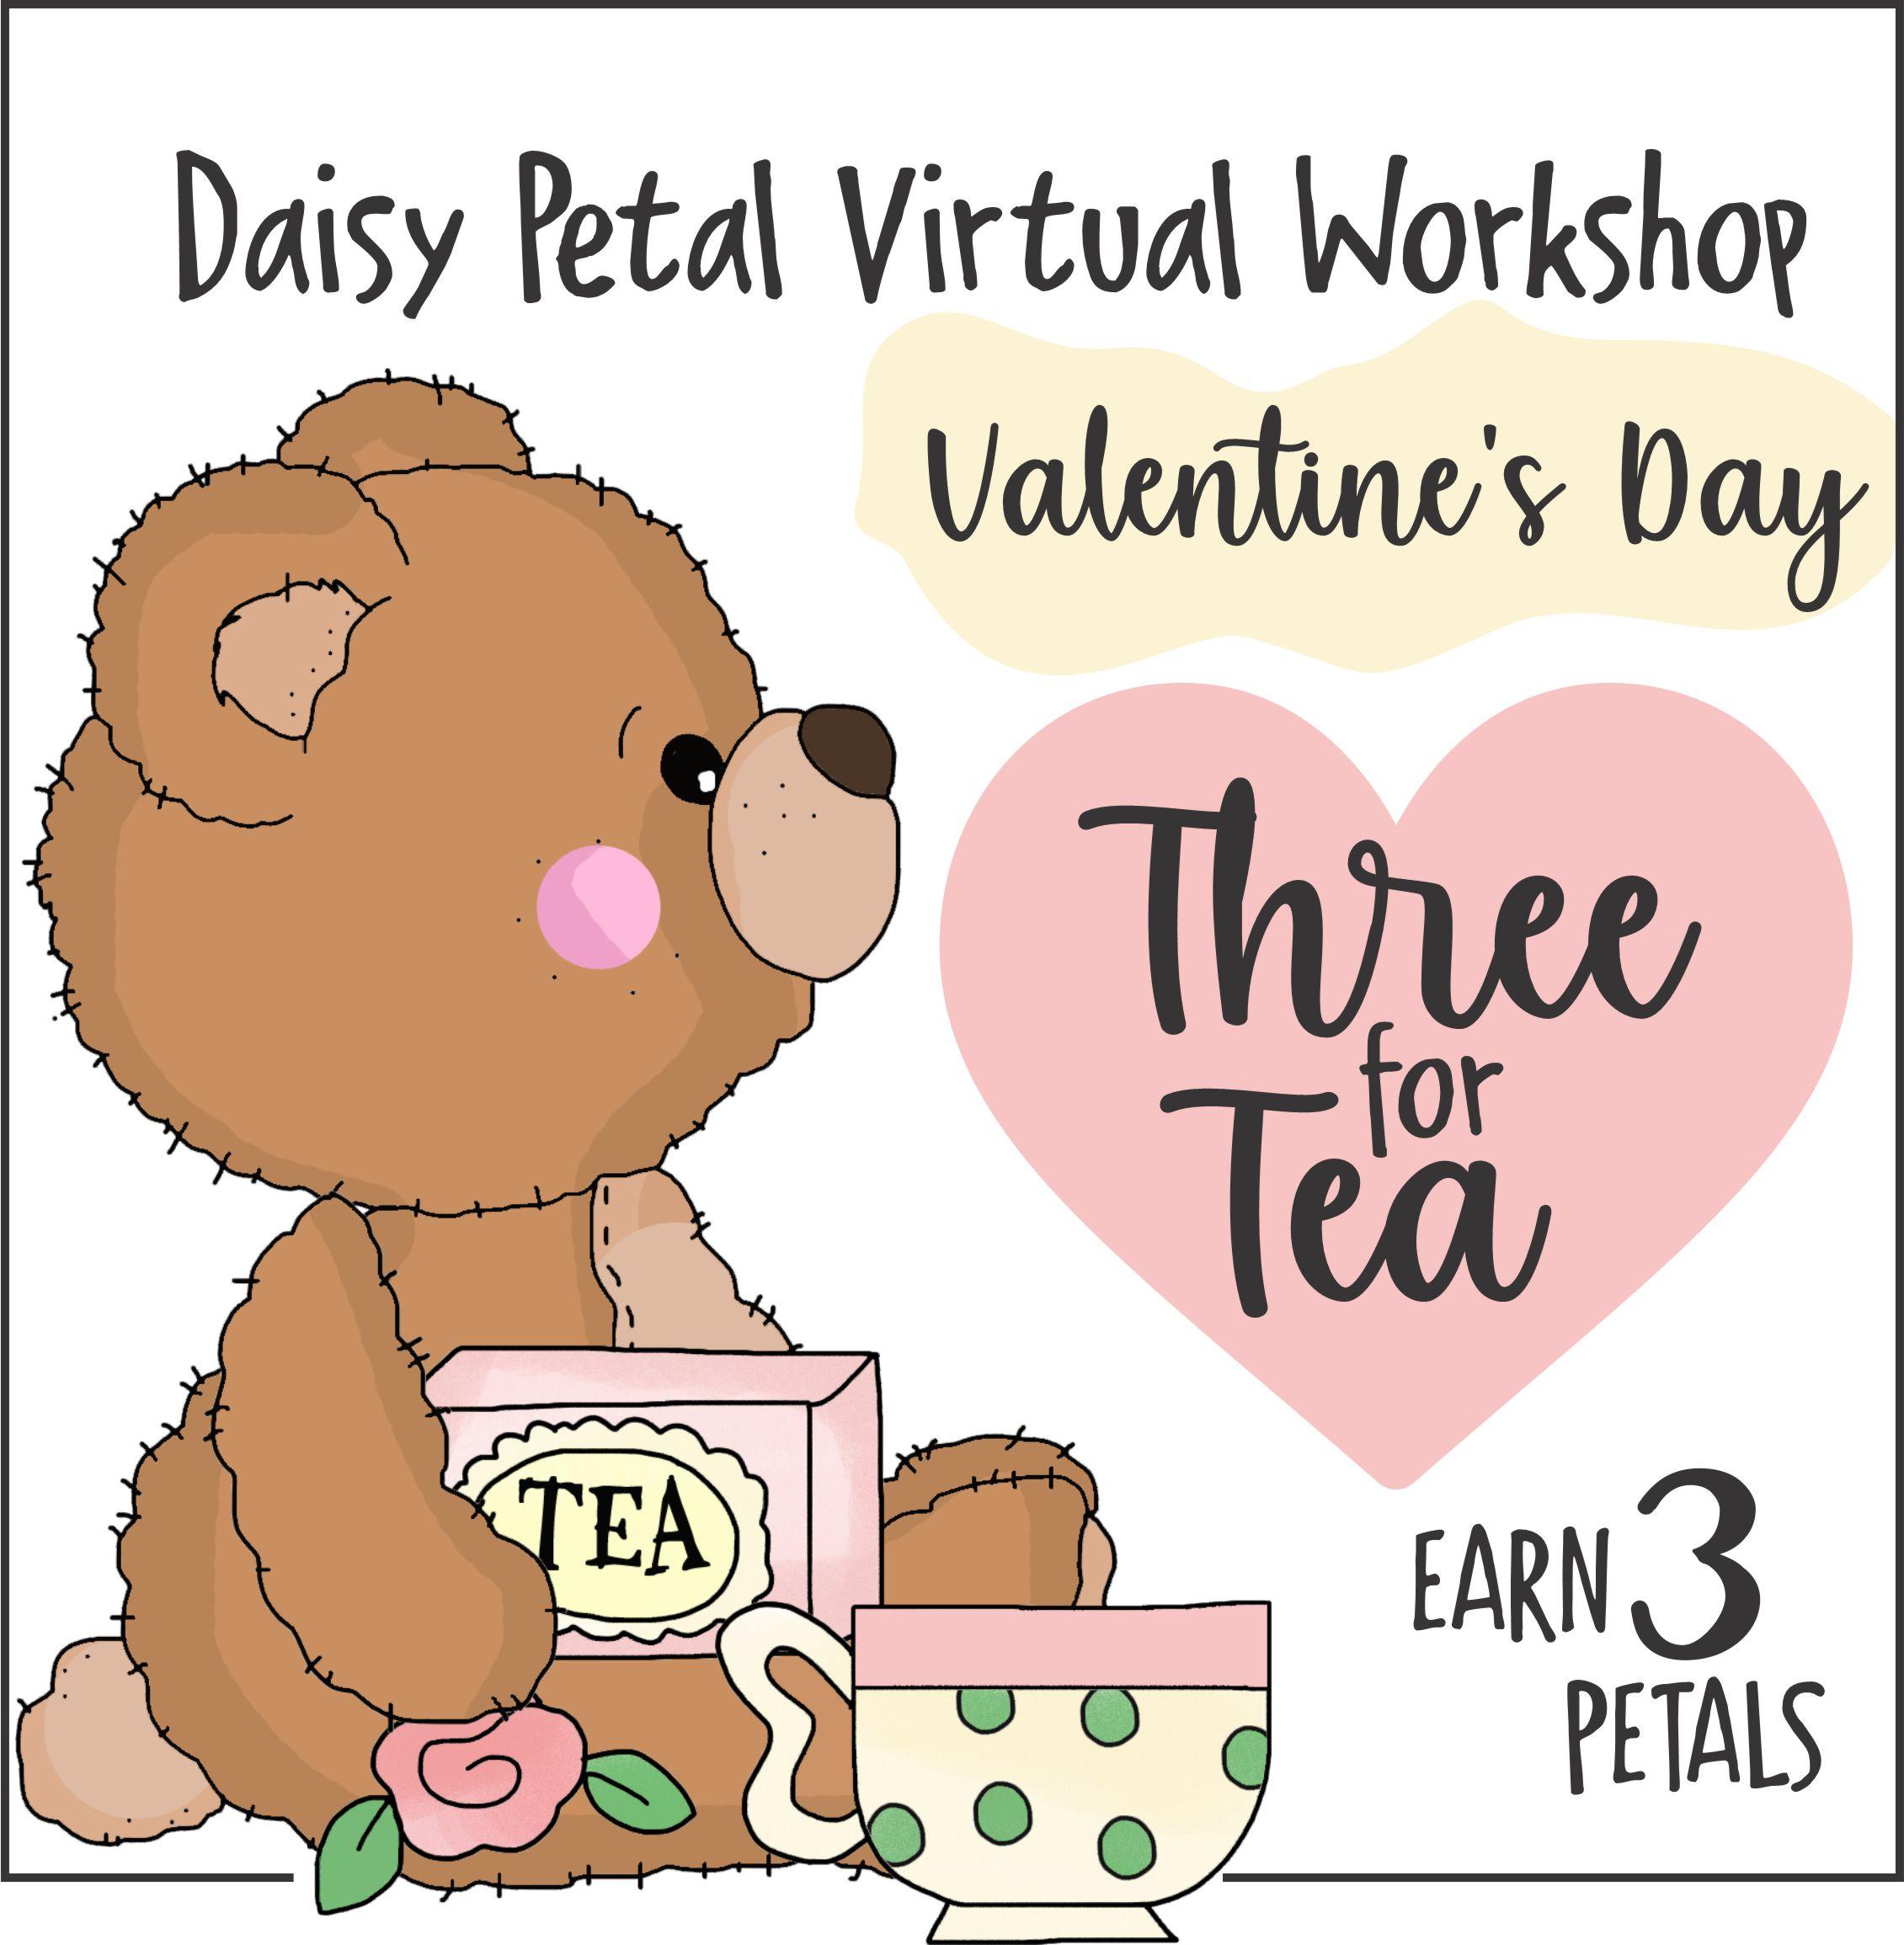 Valentine's Day Daisy Petal Workshop